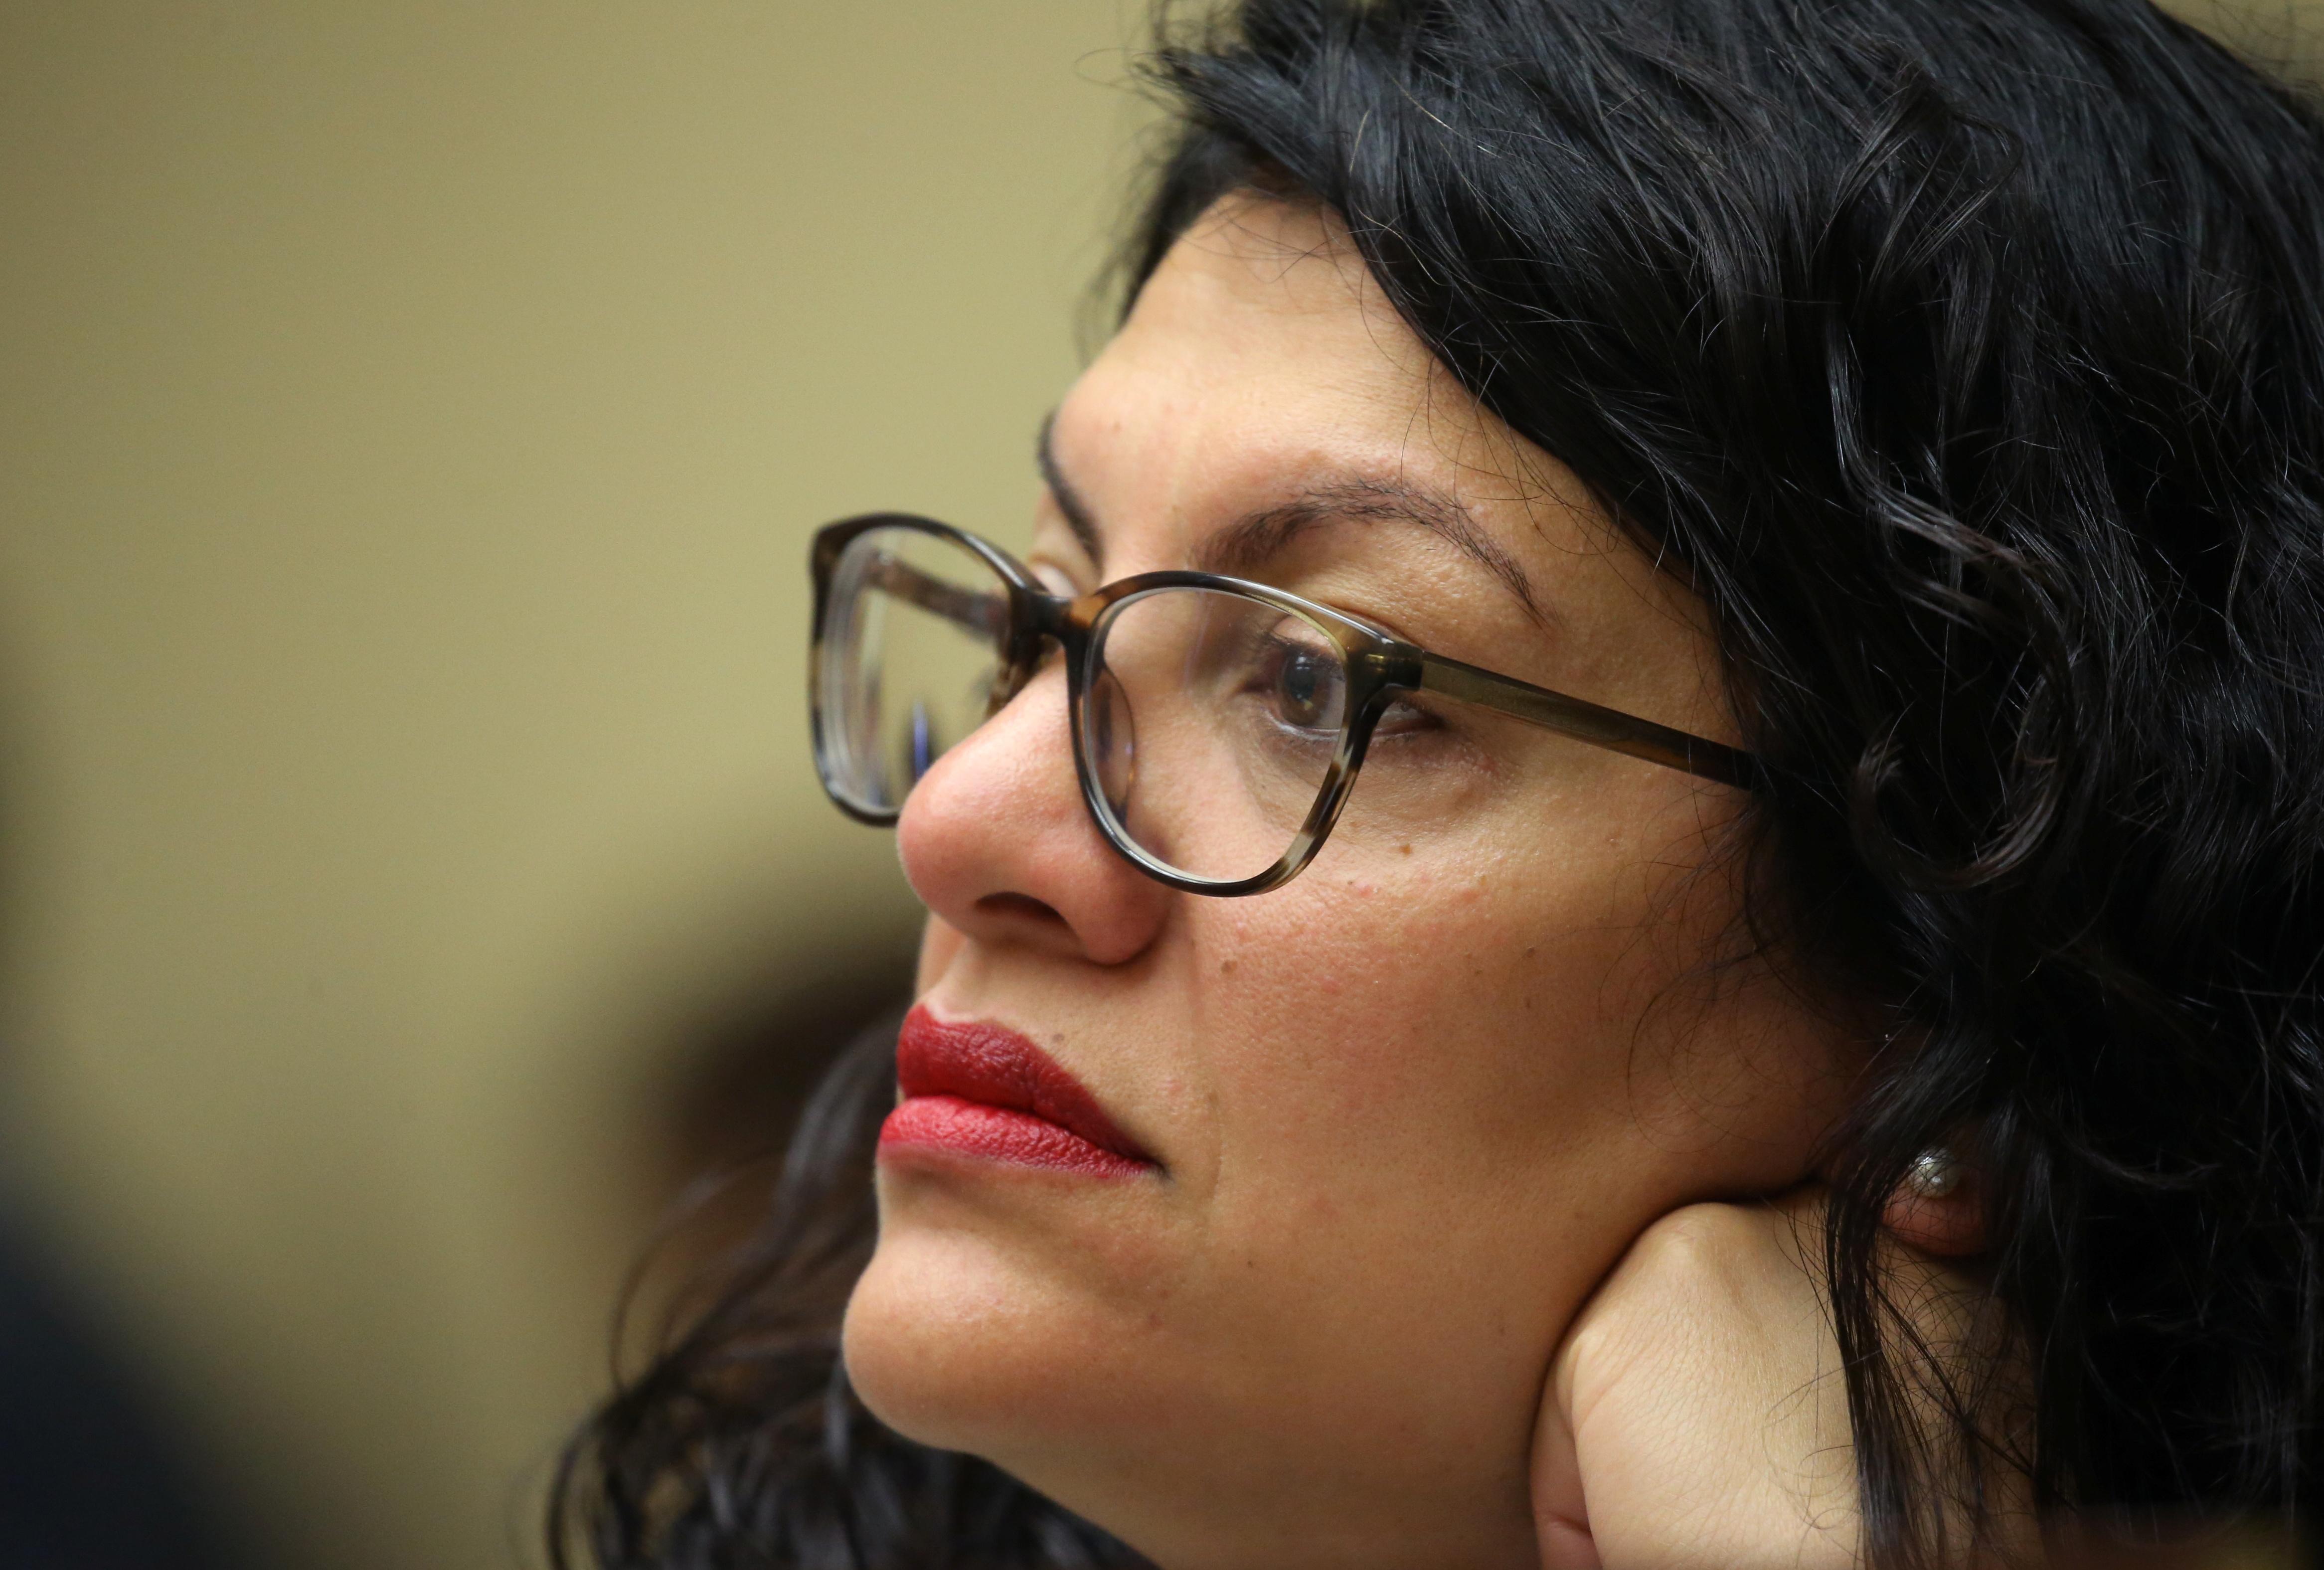 Democratic leaders back Muslim lawmaker after Holocaust comments